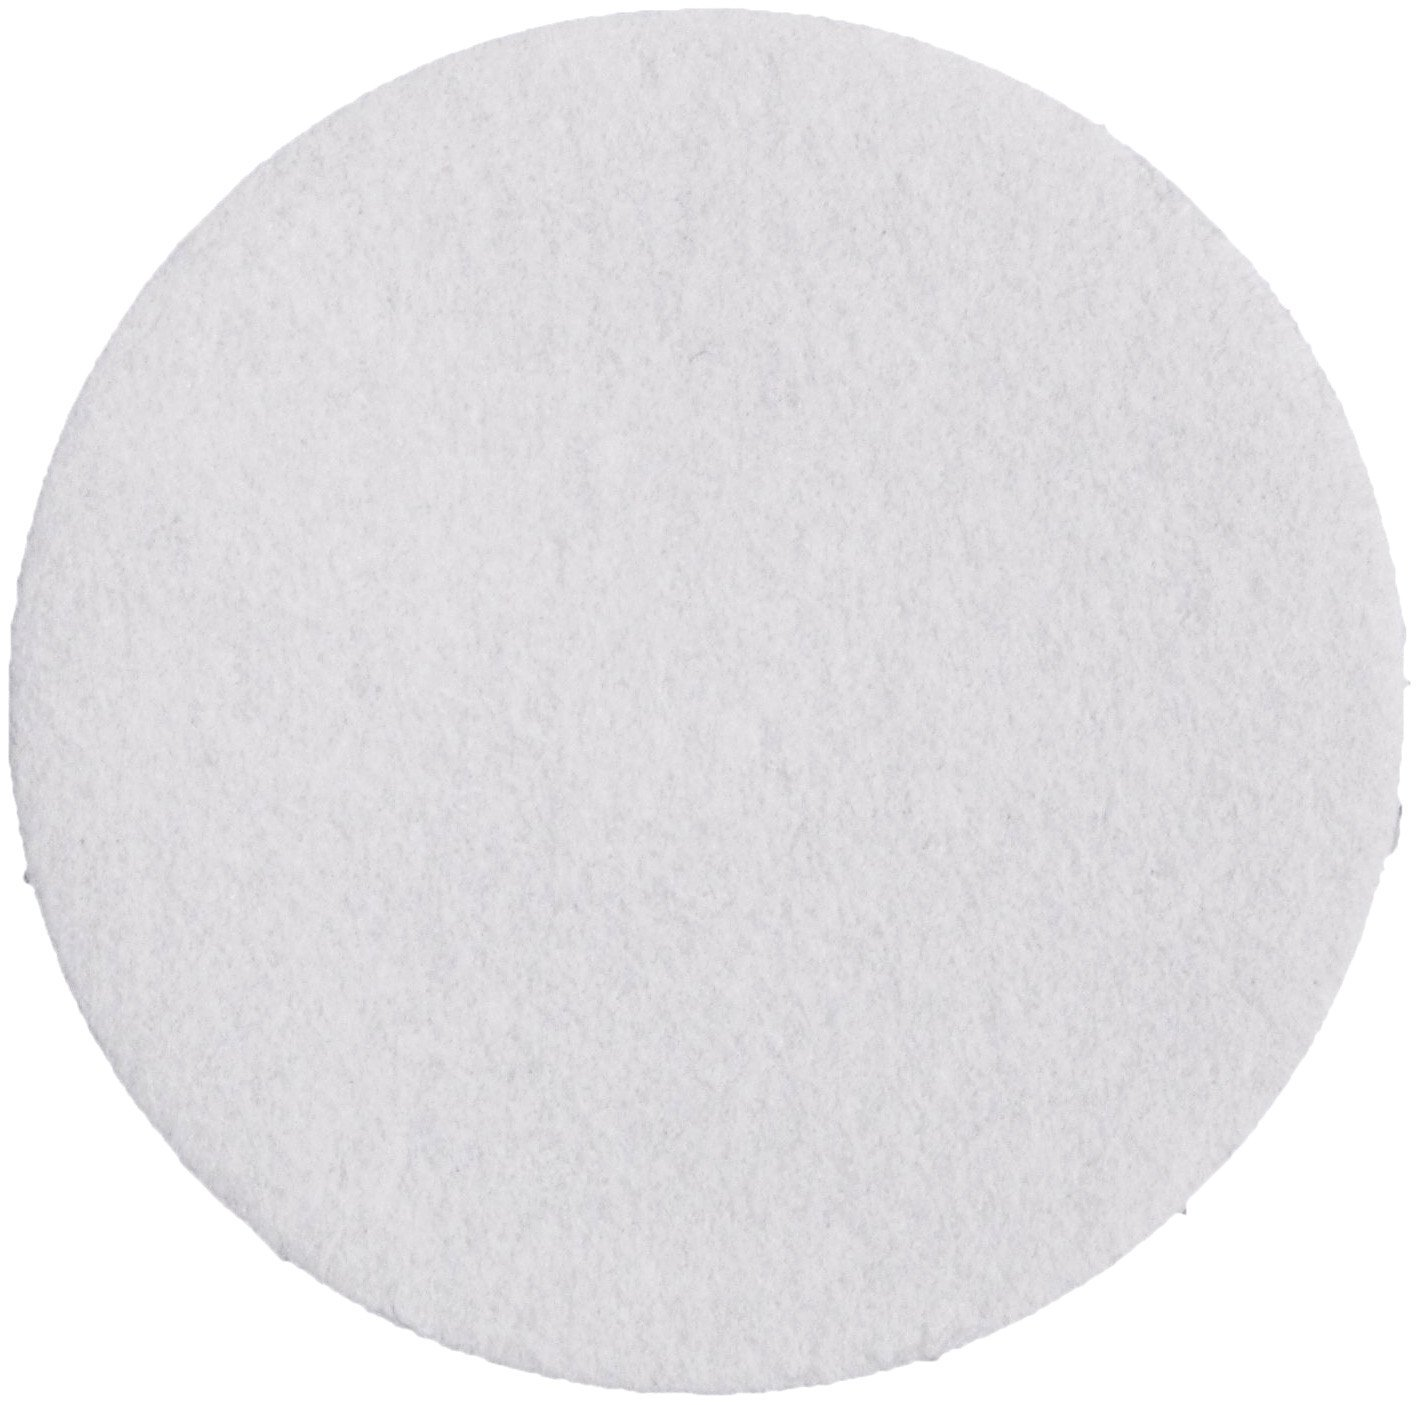 Whatman 1001-329 Quantitative Filter Paper Circles, 11 Micron, 10.5 s/100mL/sq inch Flow Rate, Grade 1, 30mm Diameter (Pack of 100) by Whatman